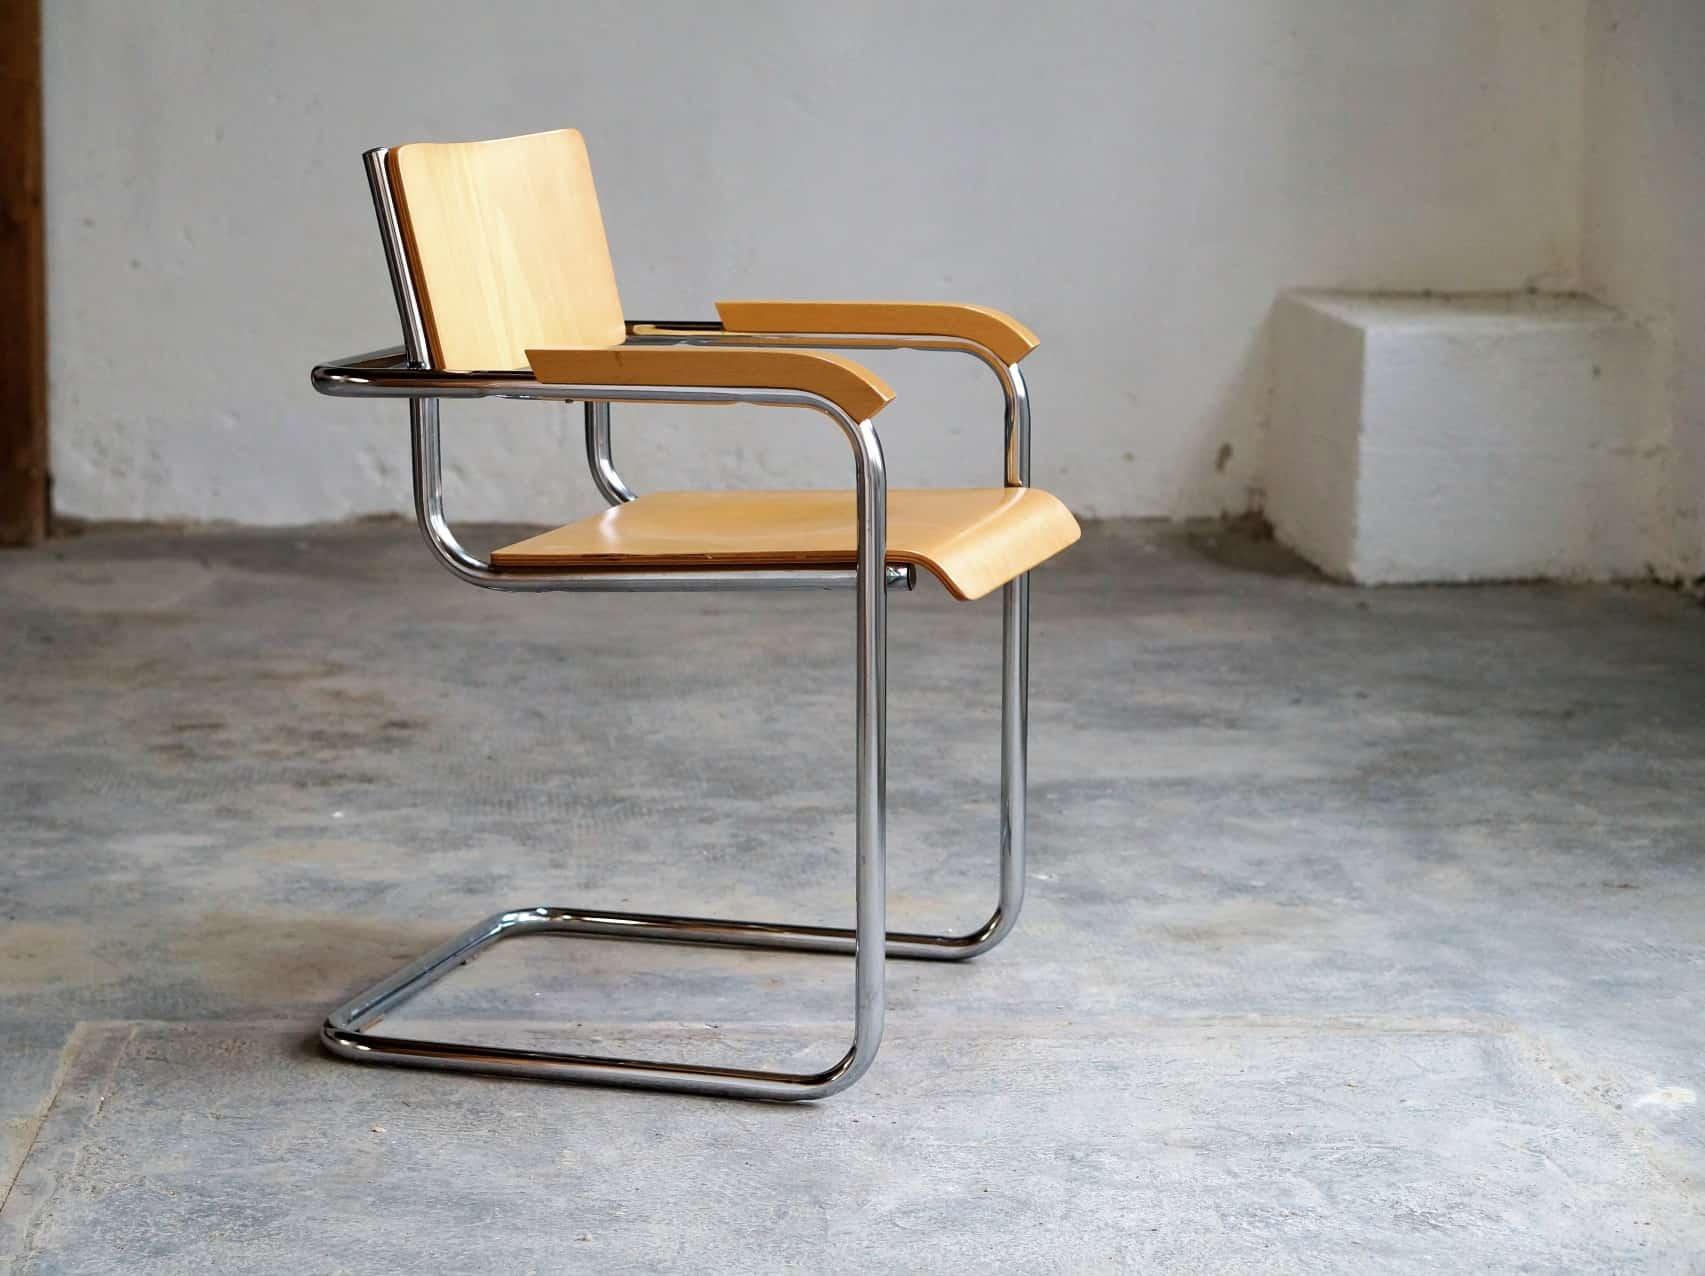 Freischwinger Stuhl Stahlrohr Armlehnstuhl Im Bauhaus Stil 60er 70er Zeitflair